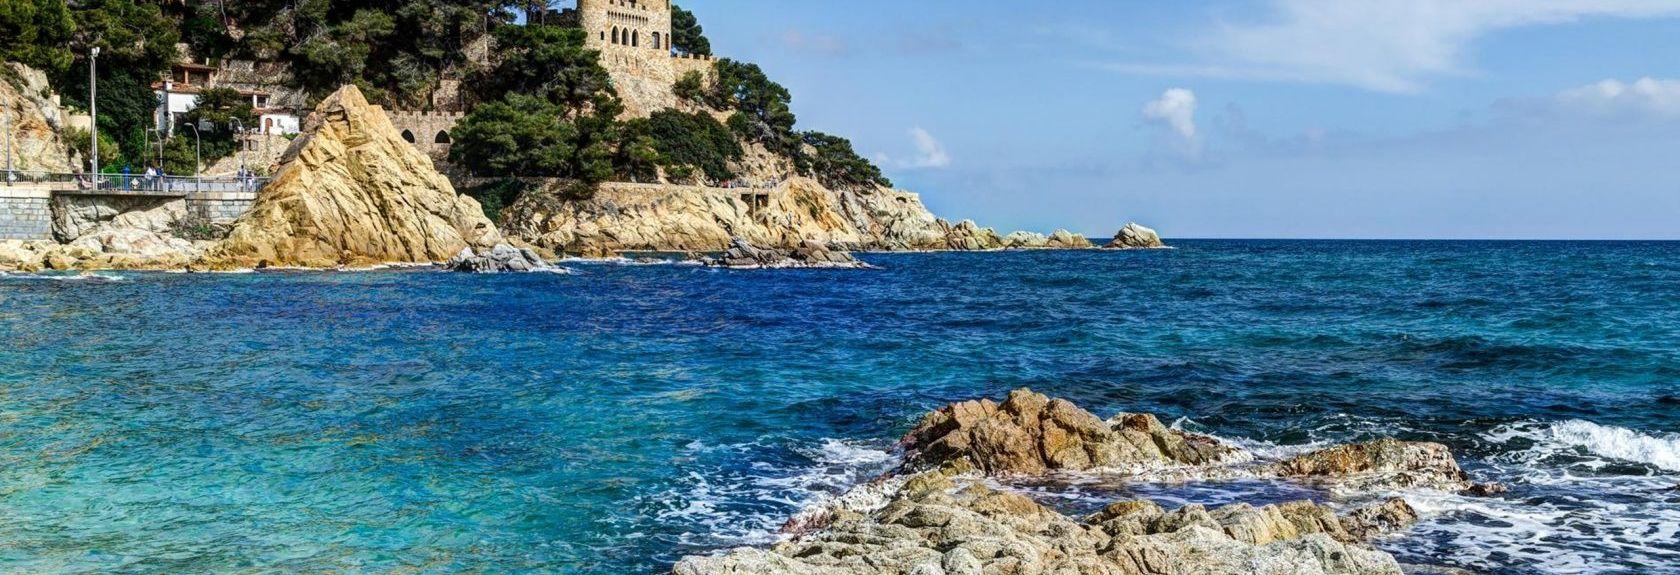 Lloret de Mar, Catalogne, Espagne